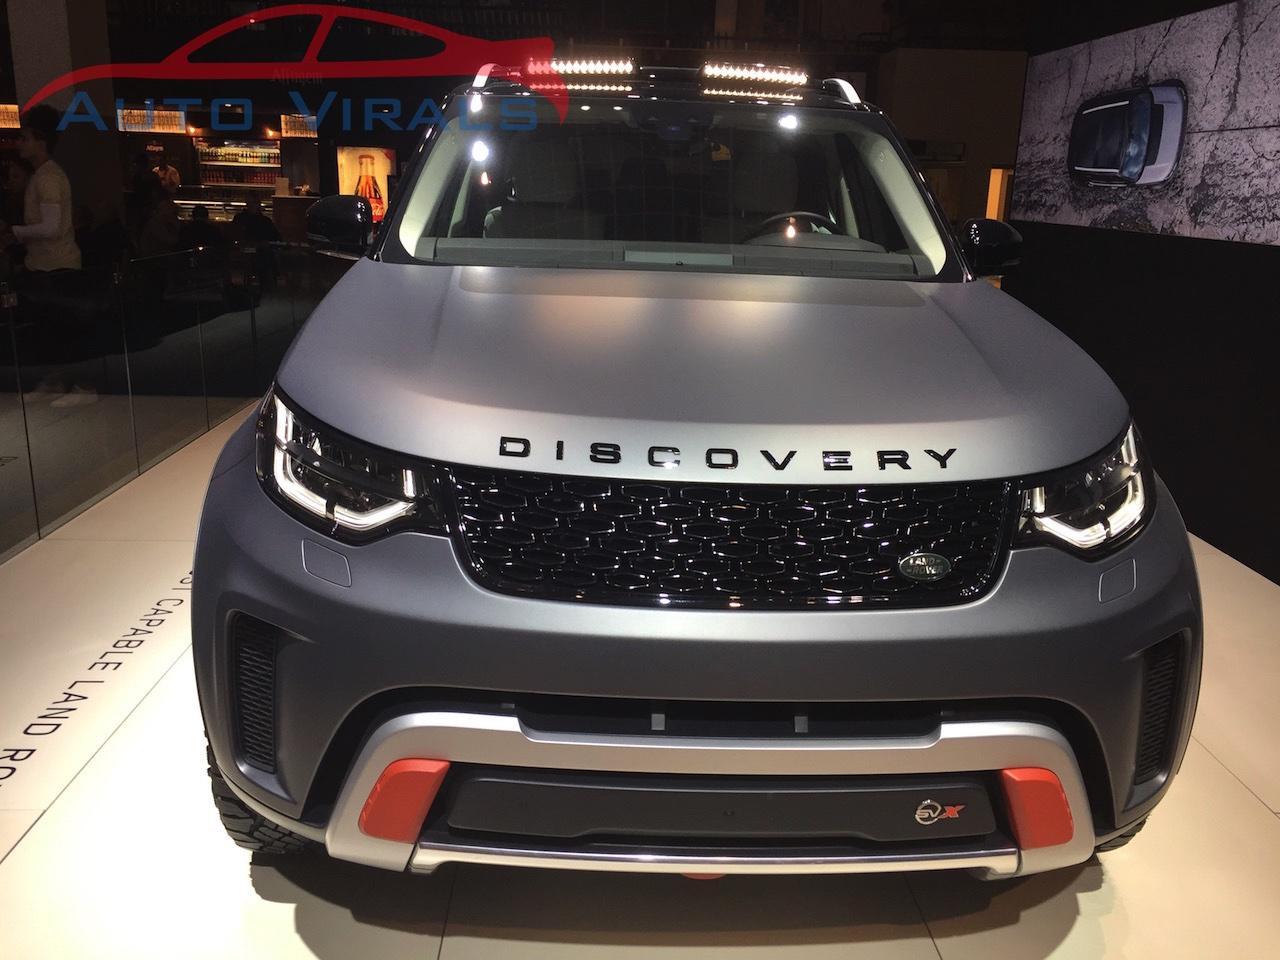 autosalon brussel land rover discovery svx 2